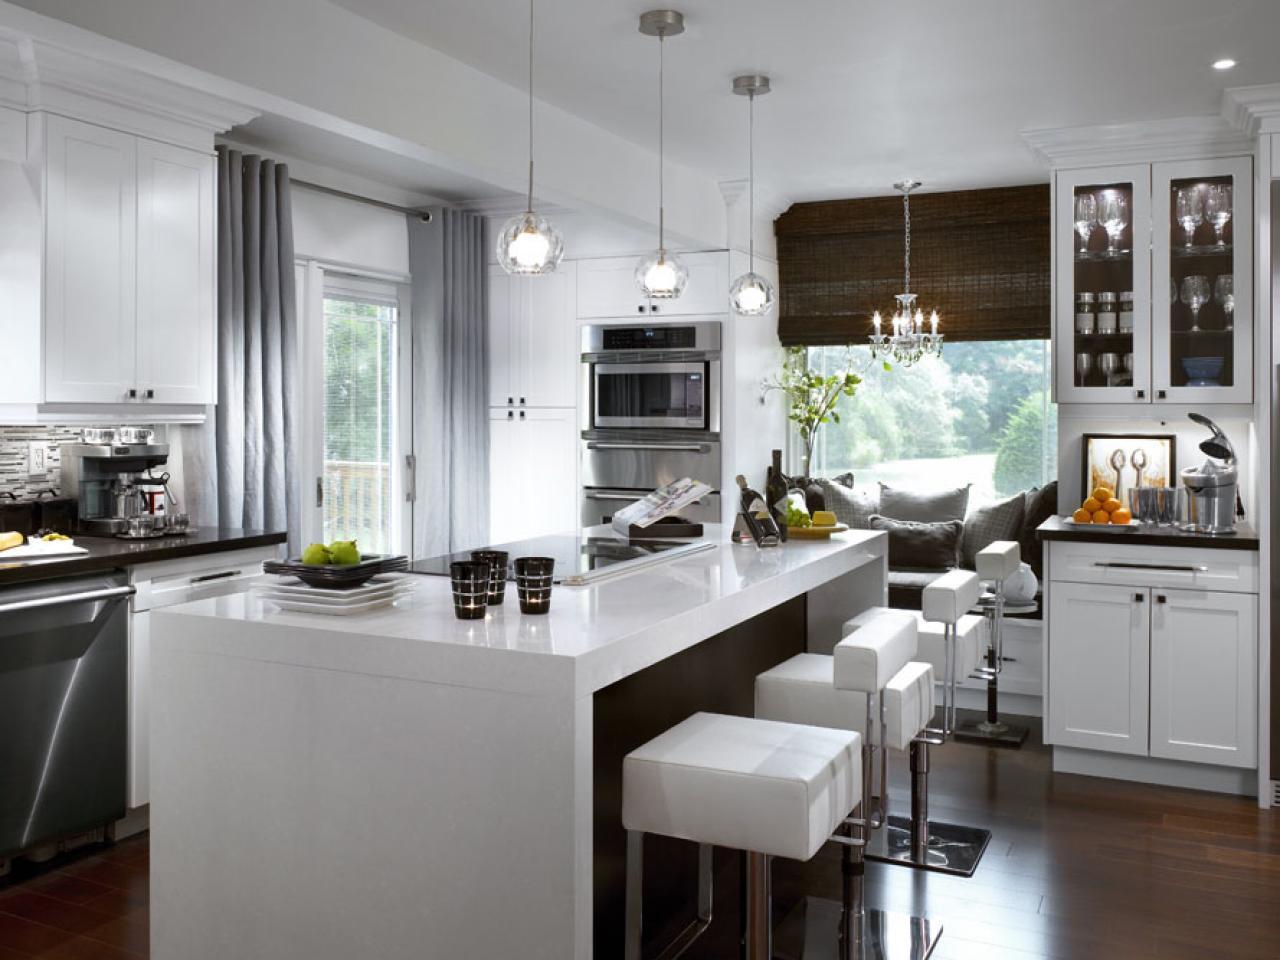 candice olson favorite kitchens photo - 6